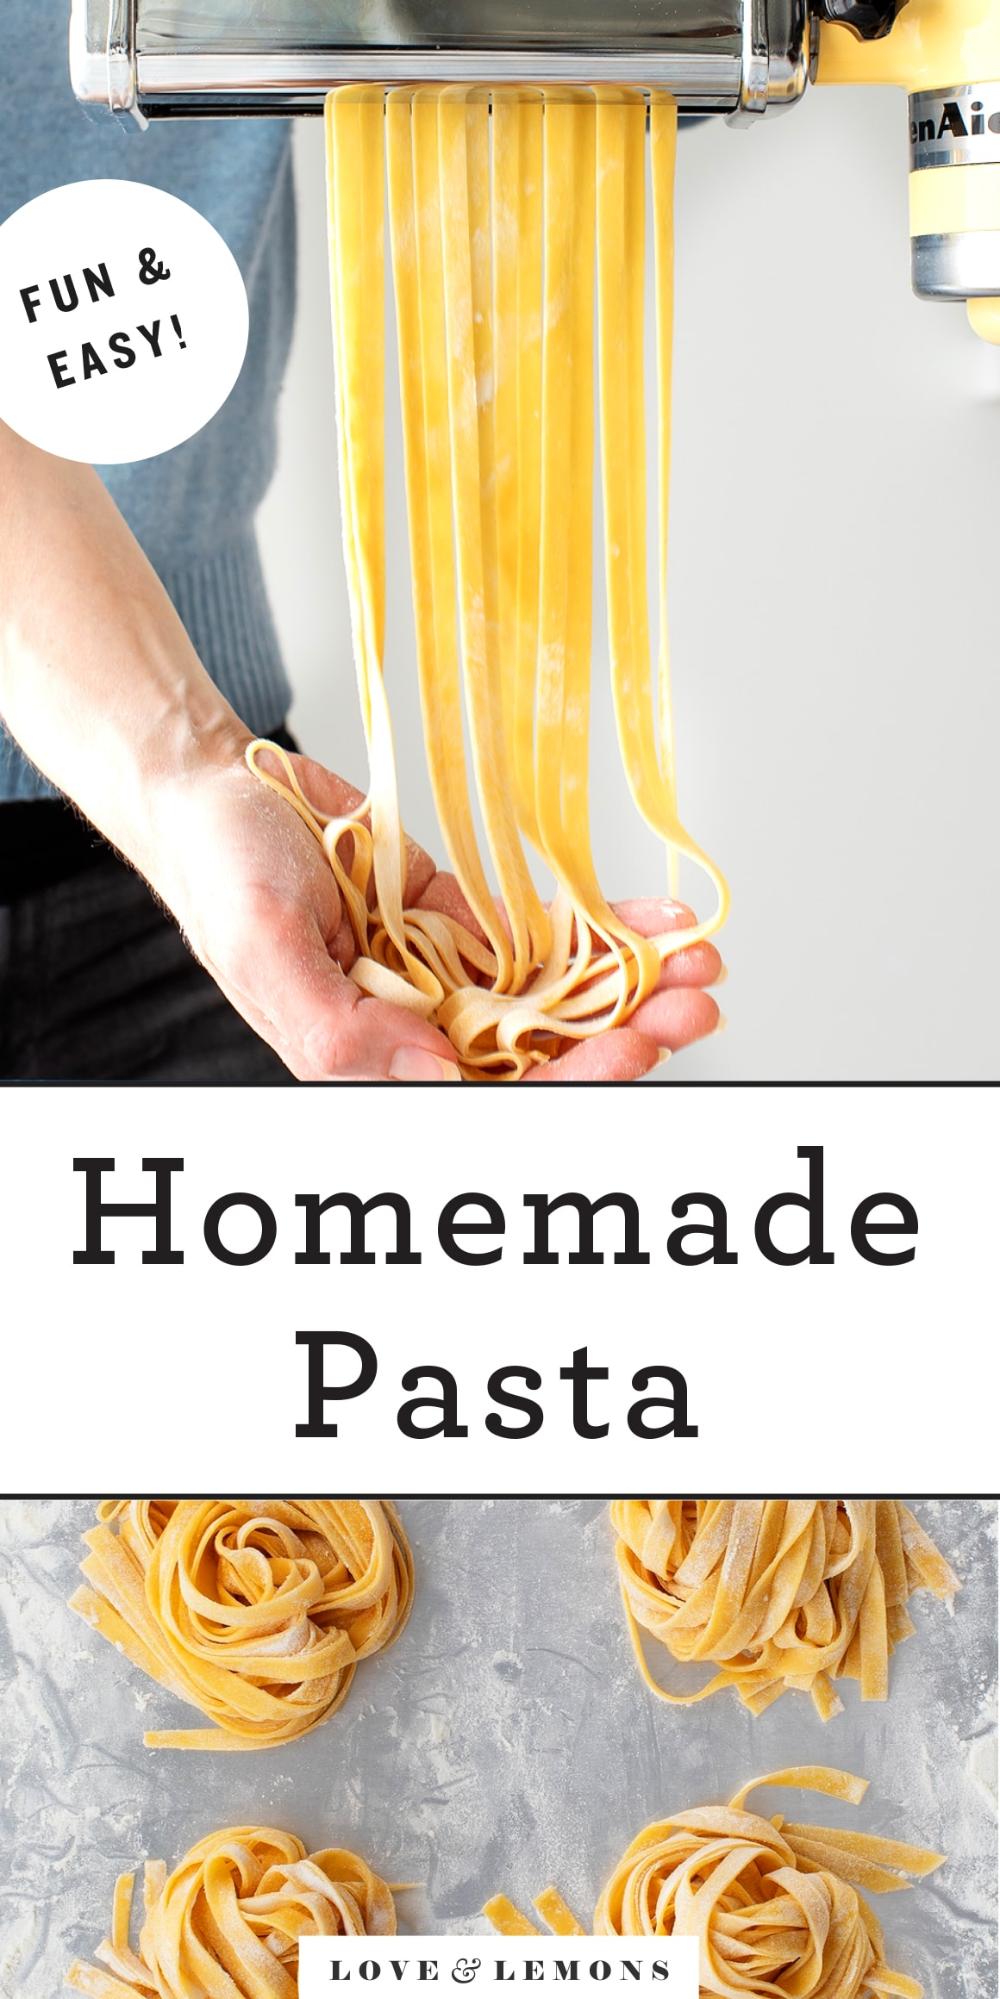 Homemade Pasta Love And Lemons Recipe In 2021 Homemade Pasta Recipe Easy Homemade Pasta Homemade Pasta